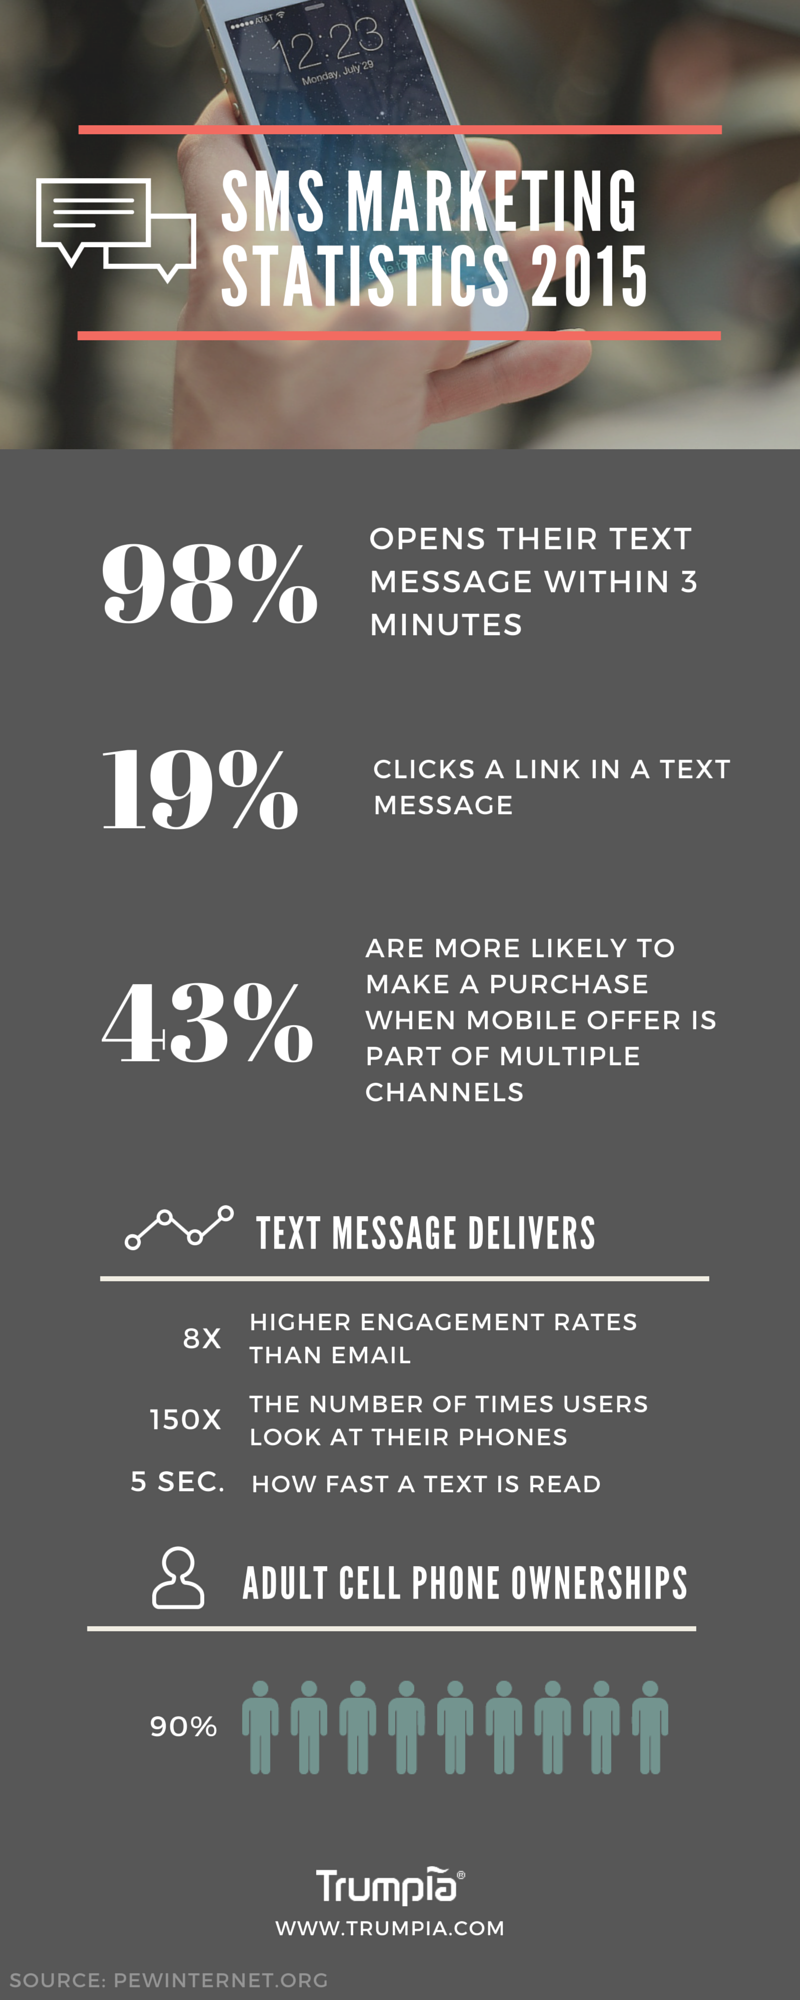 sms marketing statistics 2015